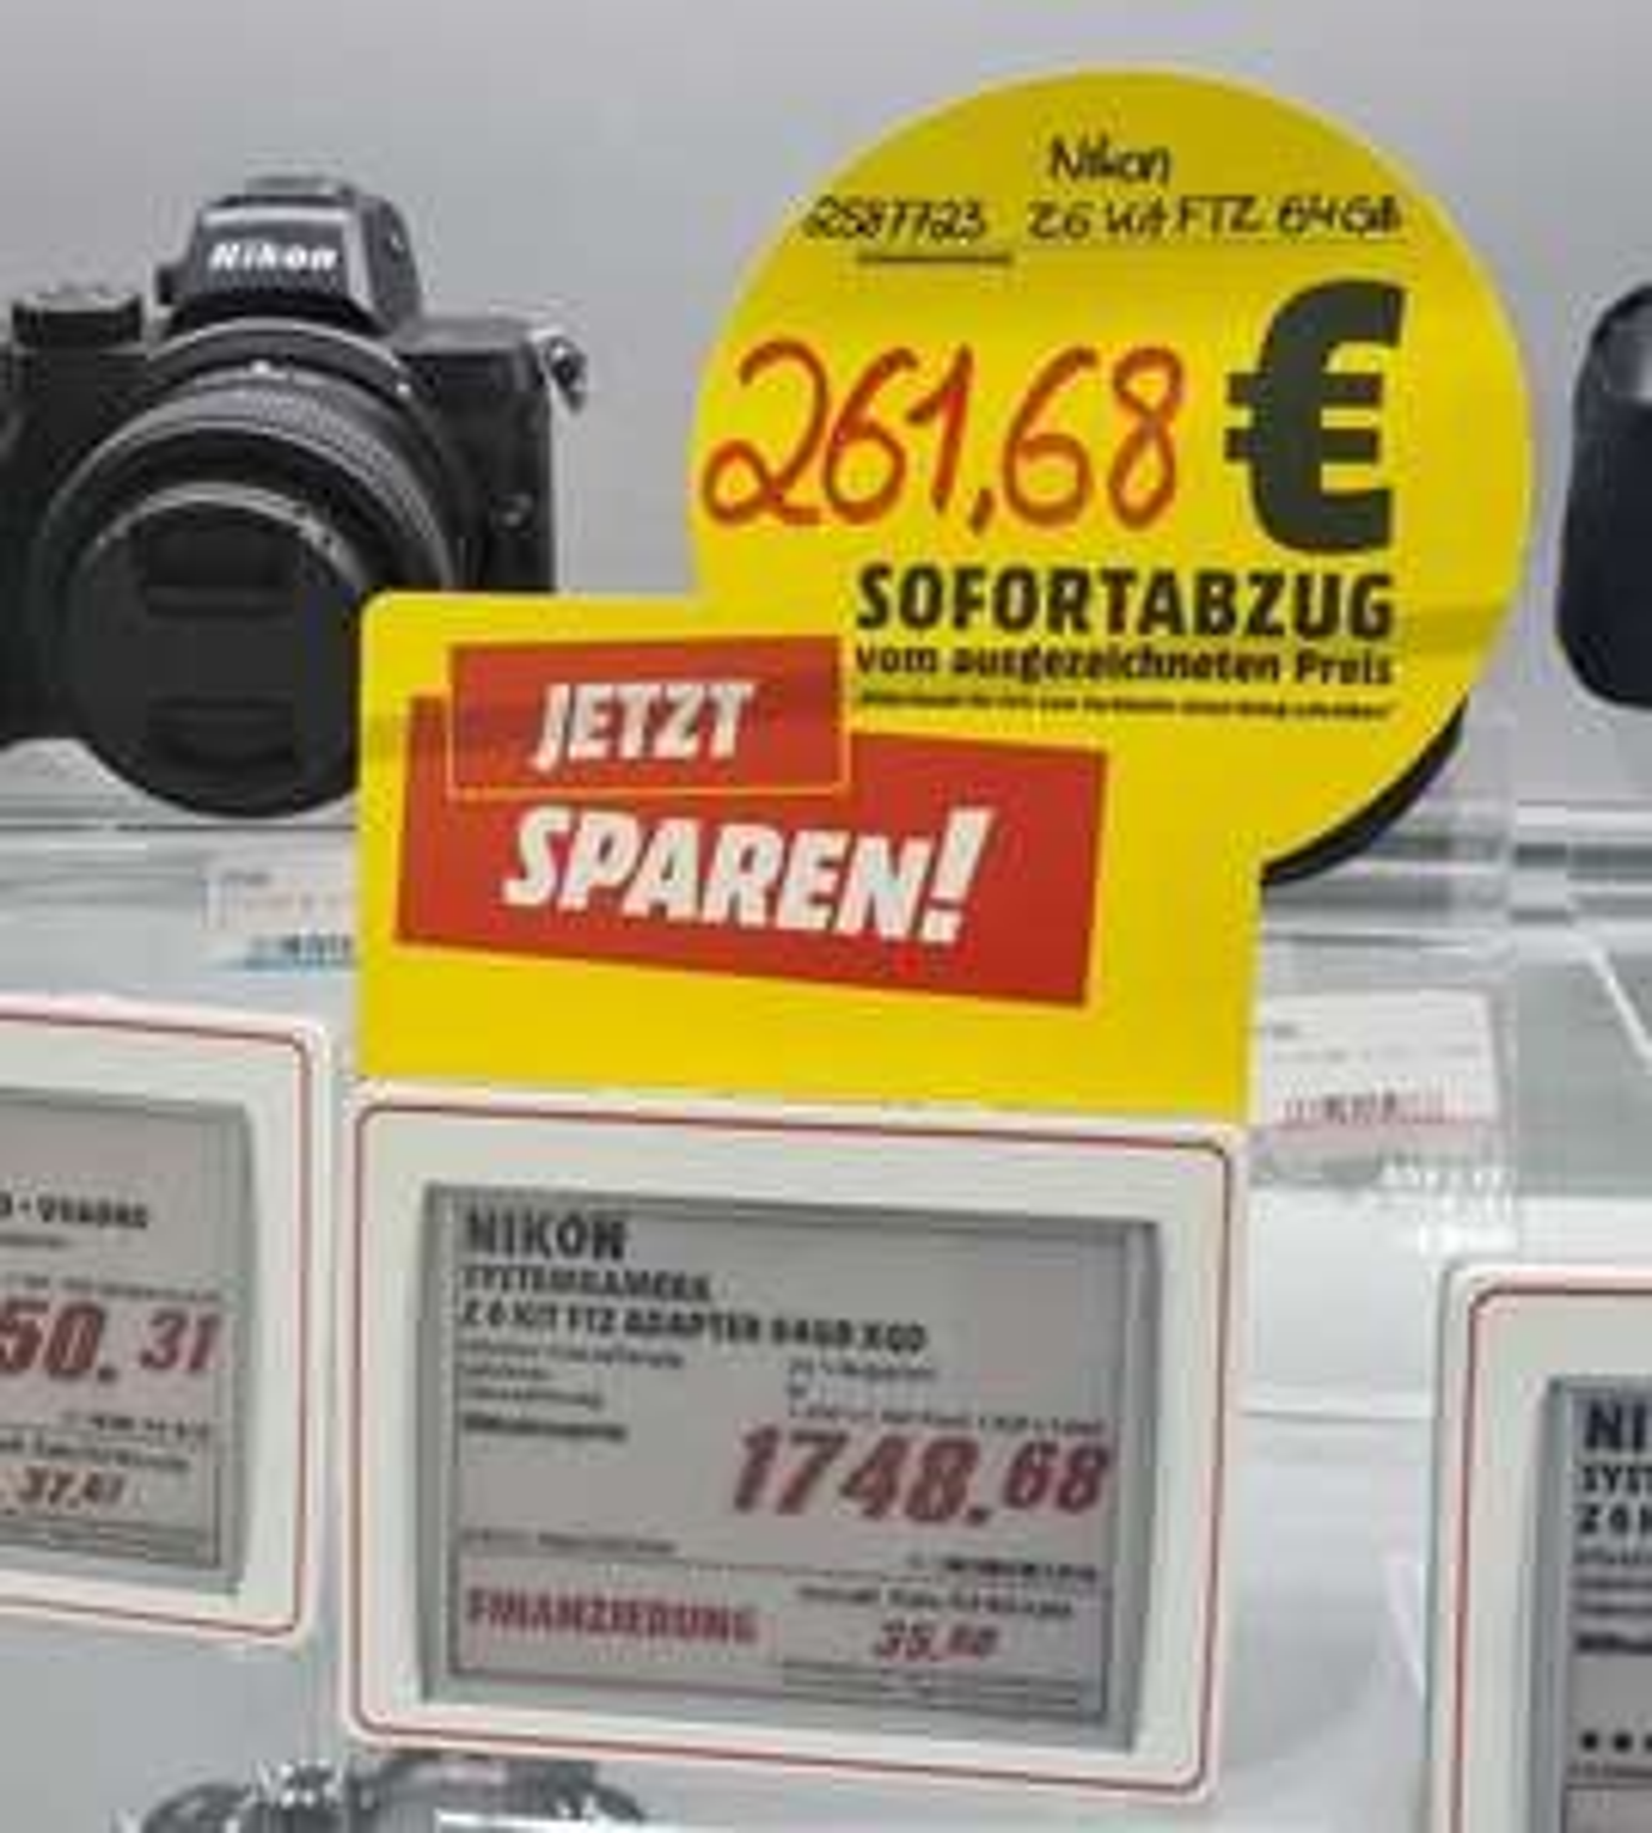 [Lokal Karlsruhe] Nikon Z6 + FTZ-Adapter + 64GB XQD für 1.487 Euro